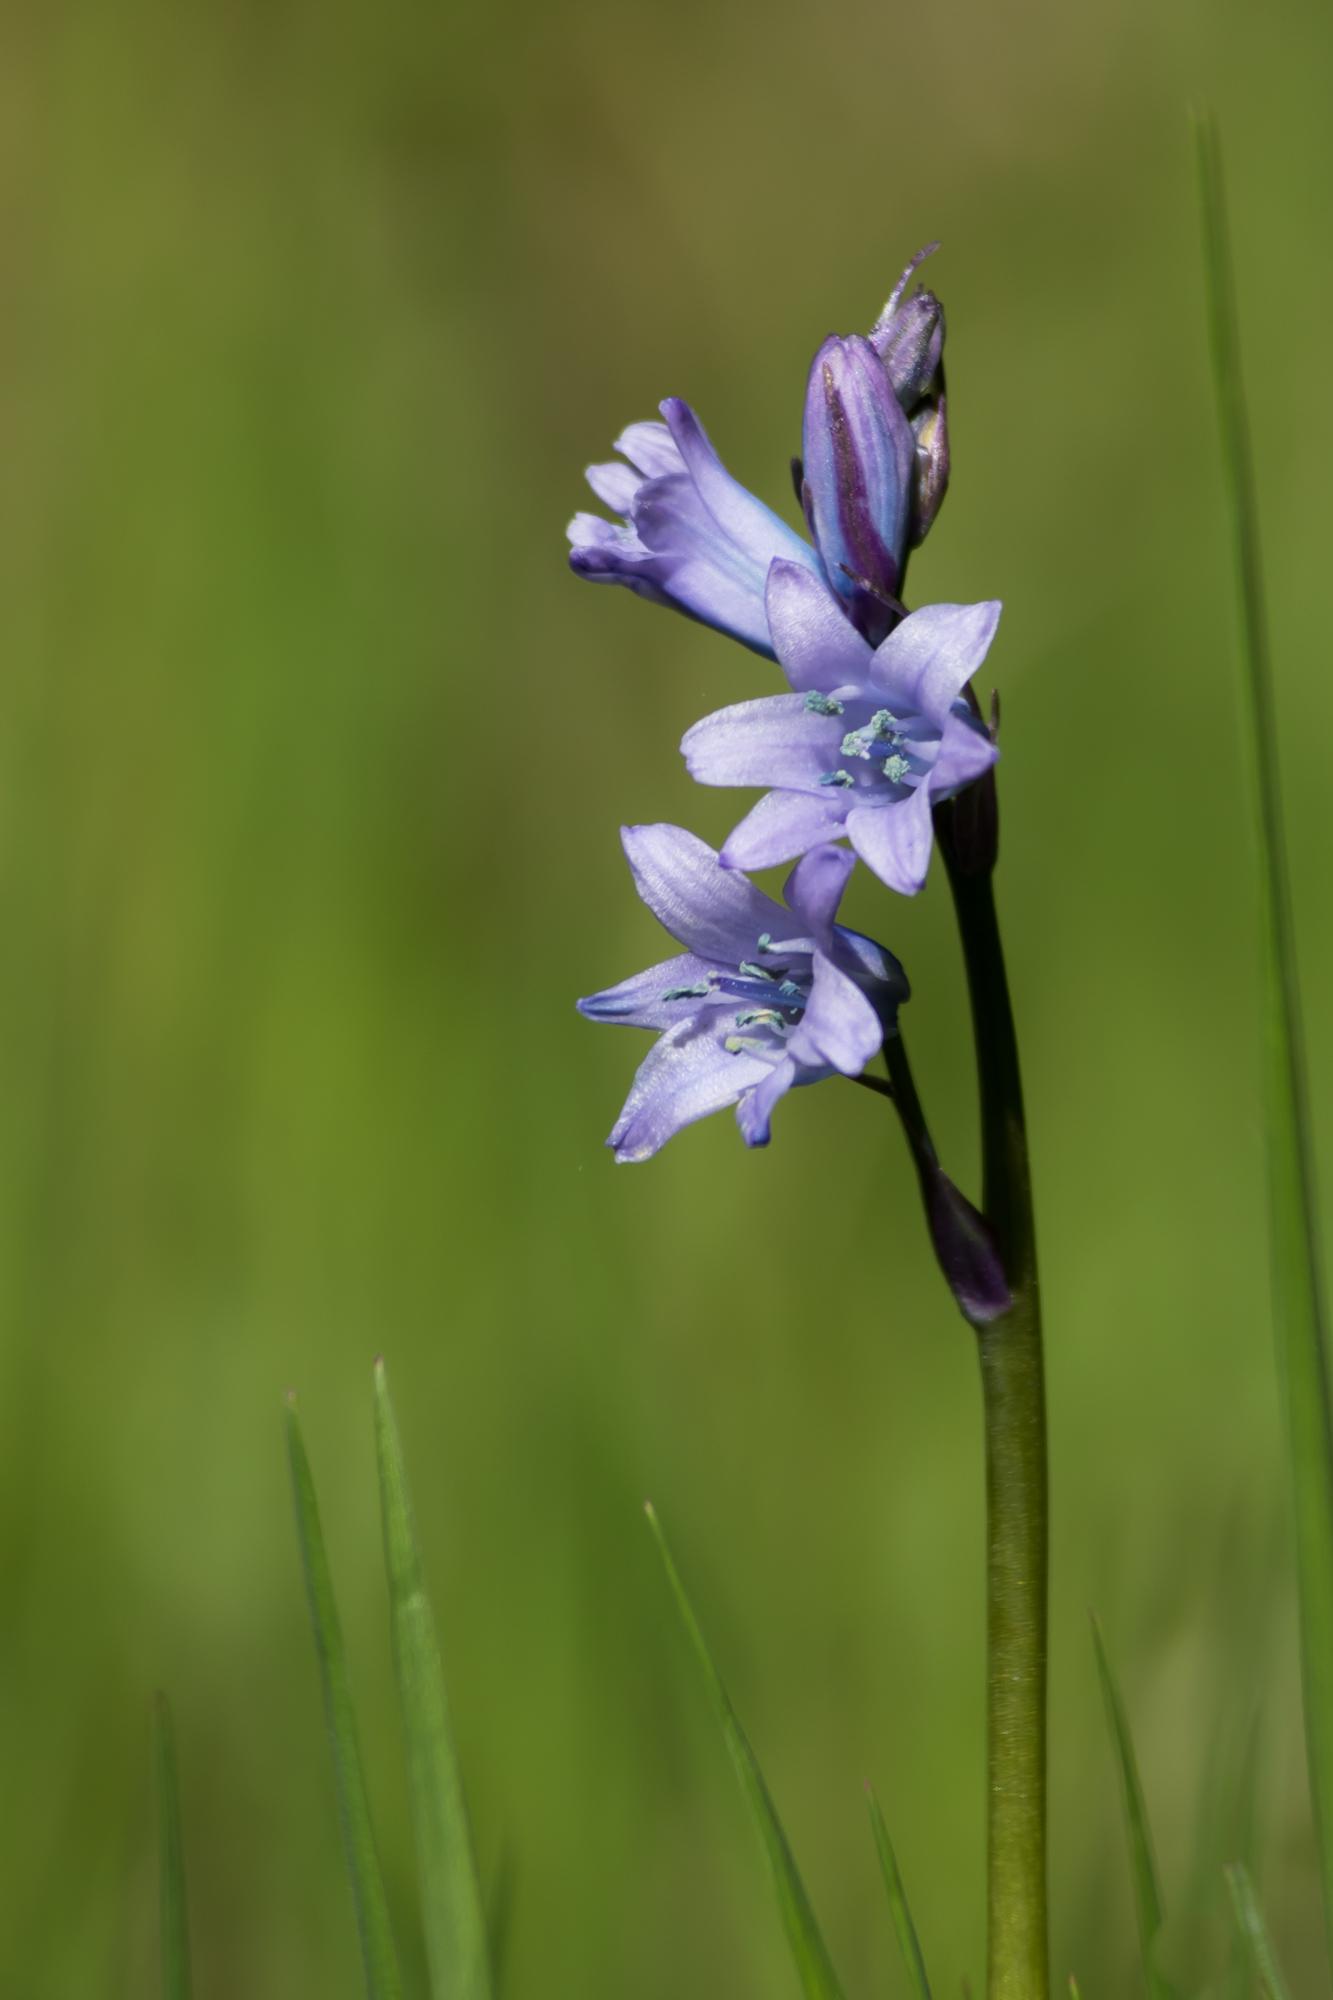 2015-05-09 Jacinto dos campos (Hyacinthoides hispanica) SE (1)